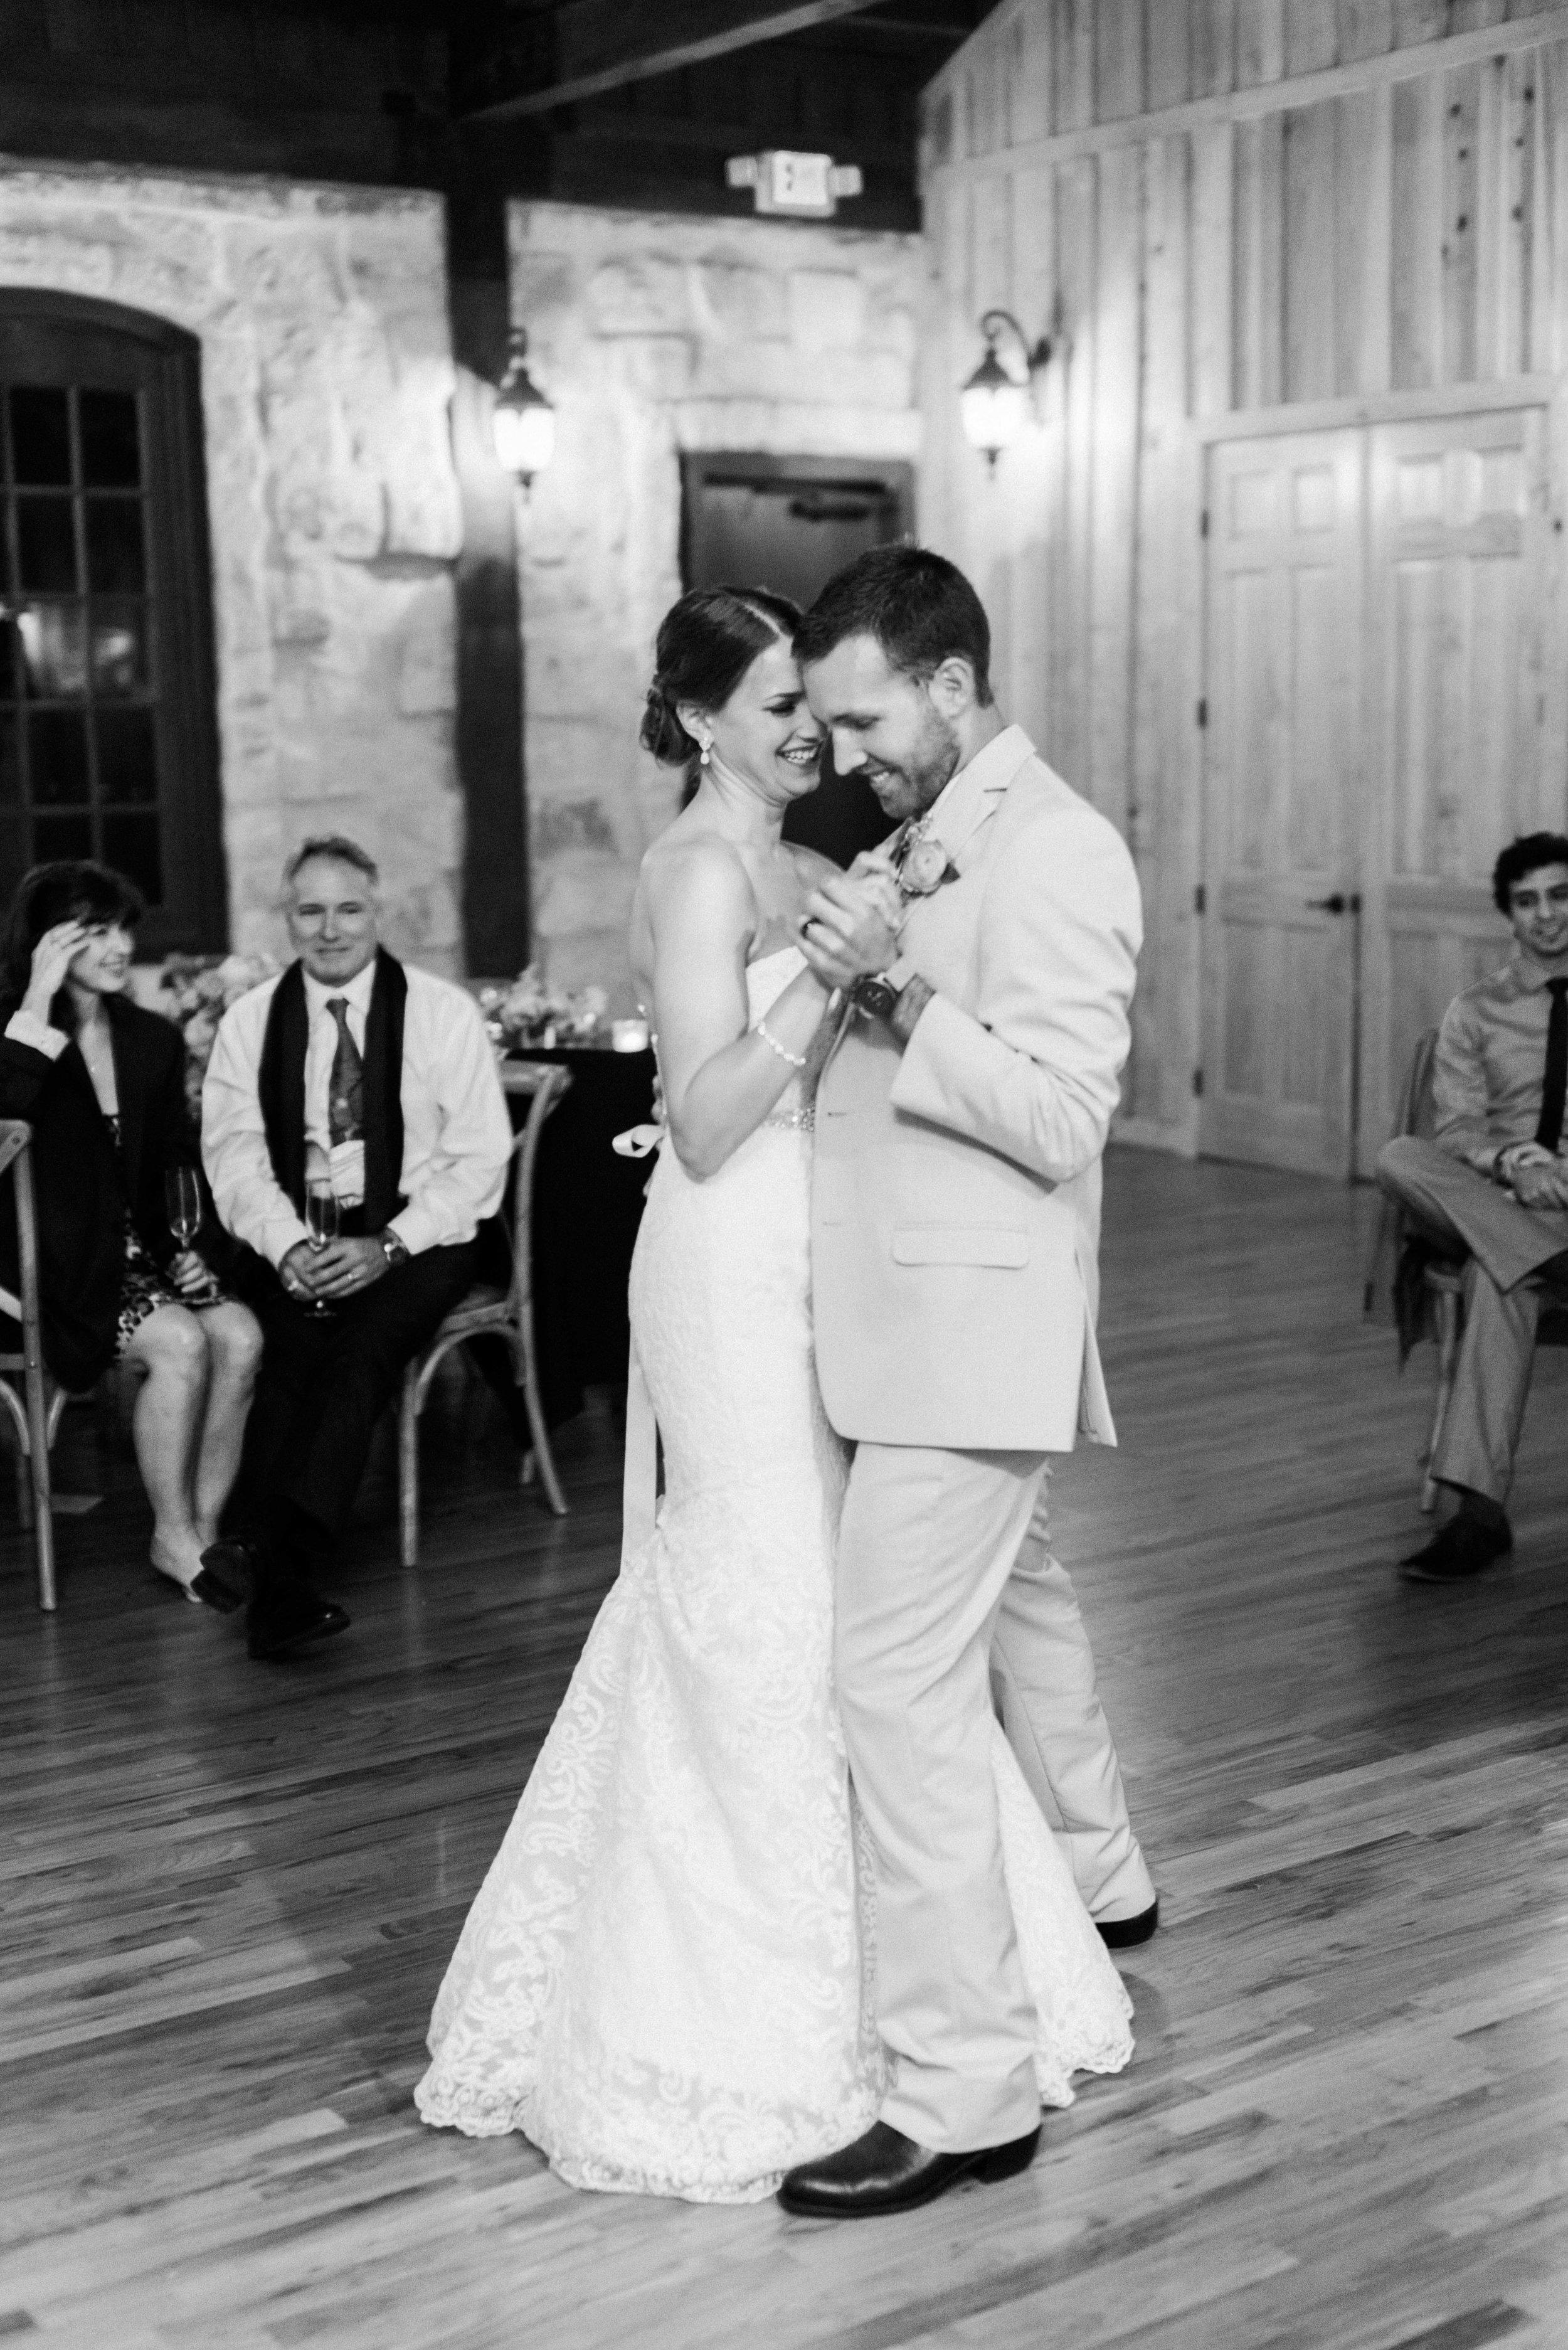 The-Knot-Wedding-Houston-Photographer-Fine-Art-Dana-Fernandez-Photography-Film-33.jpg